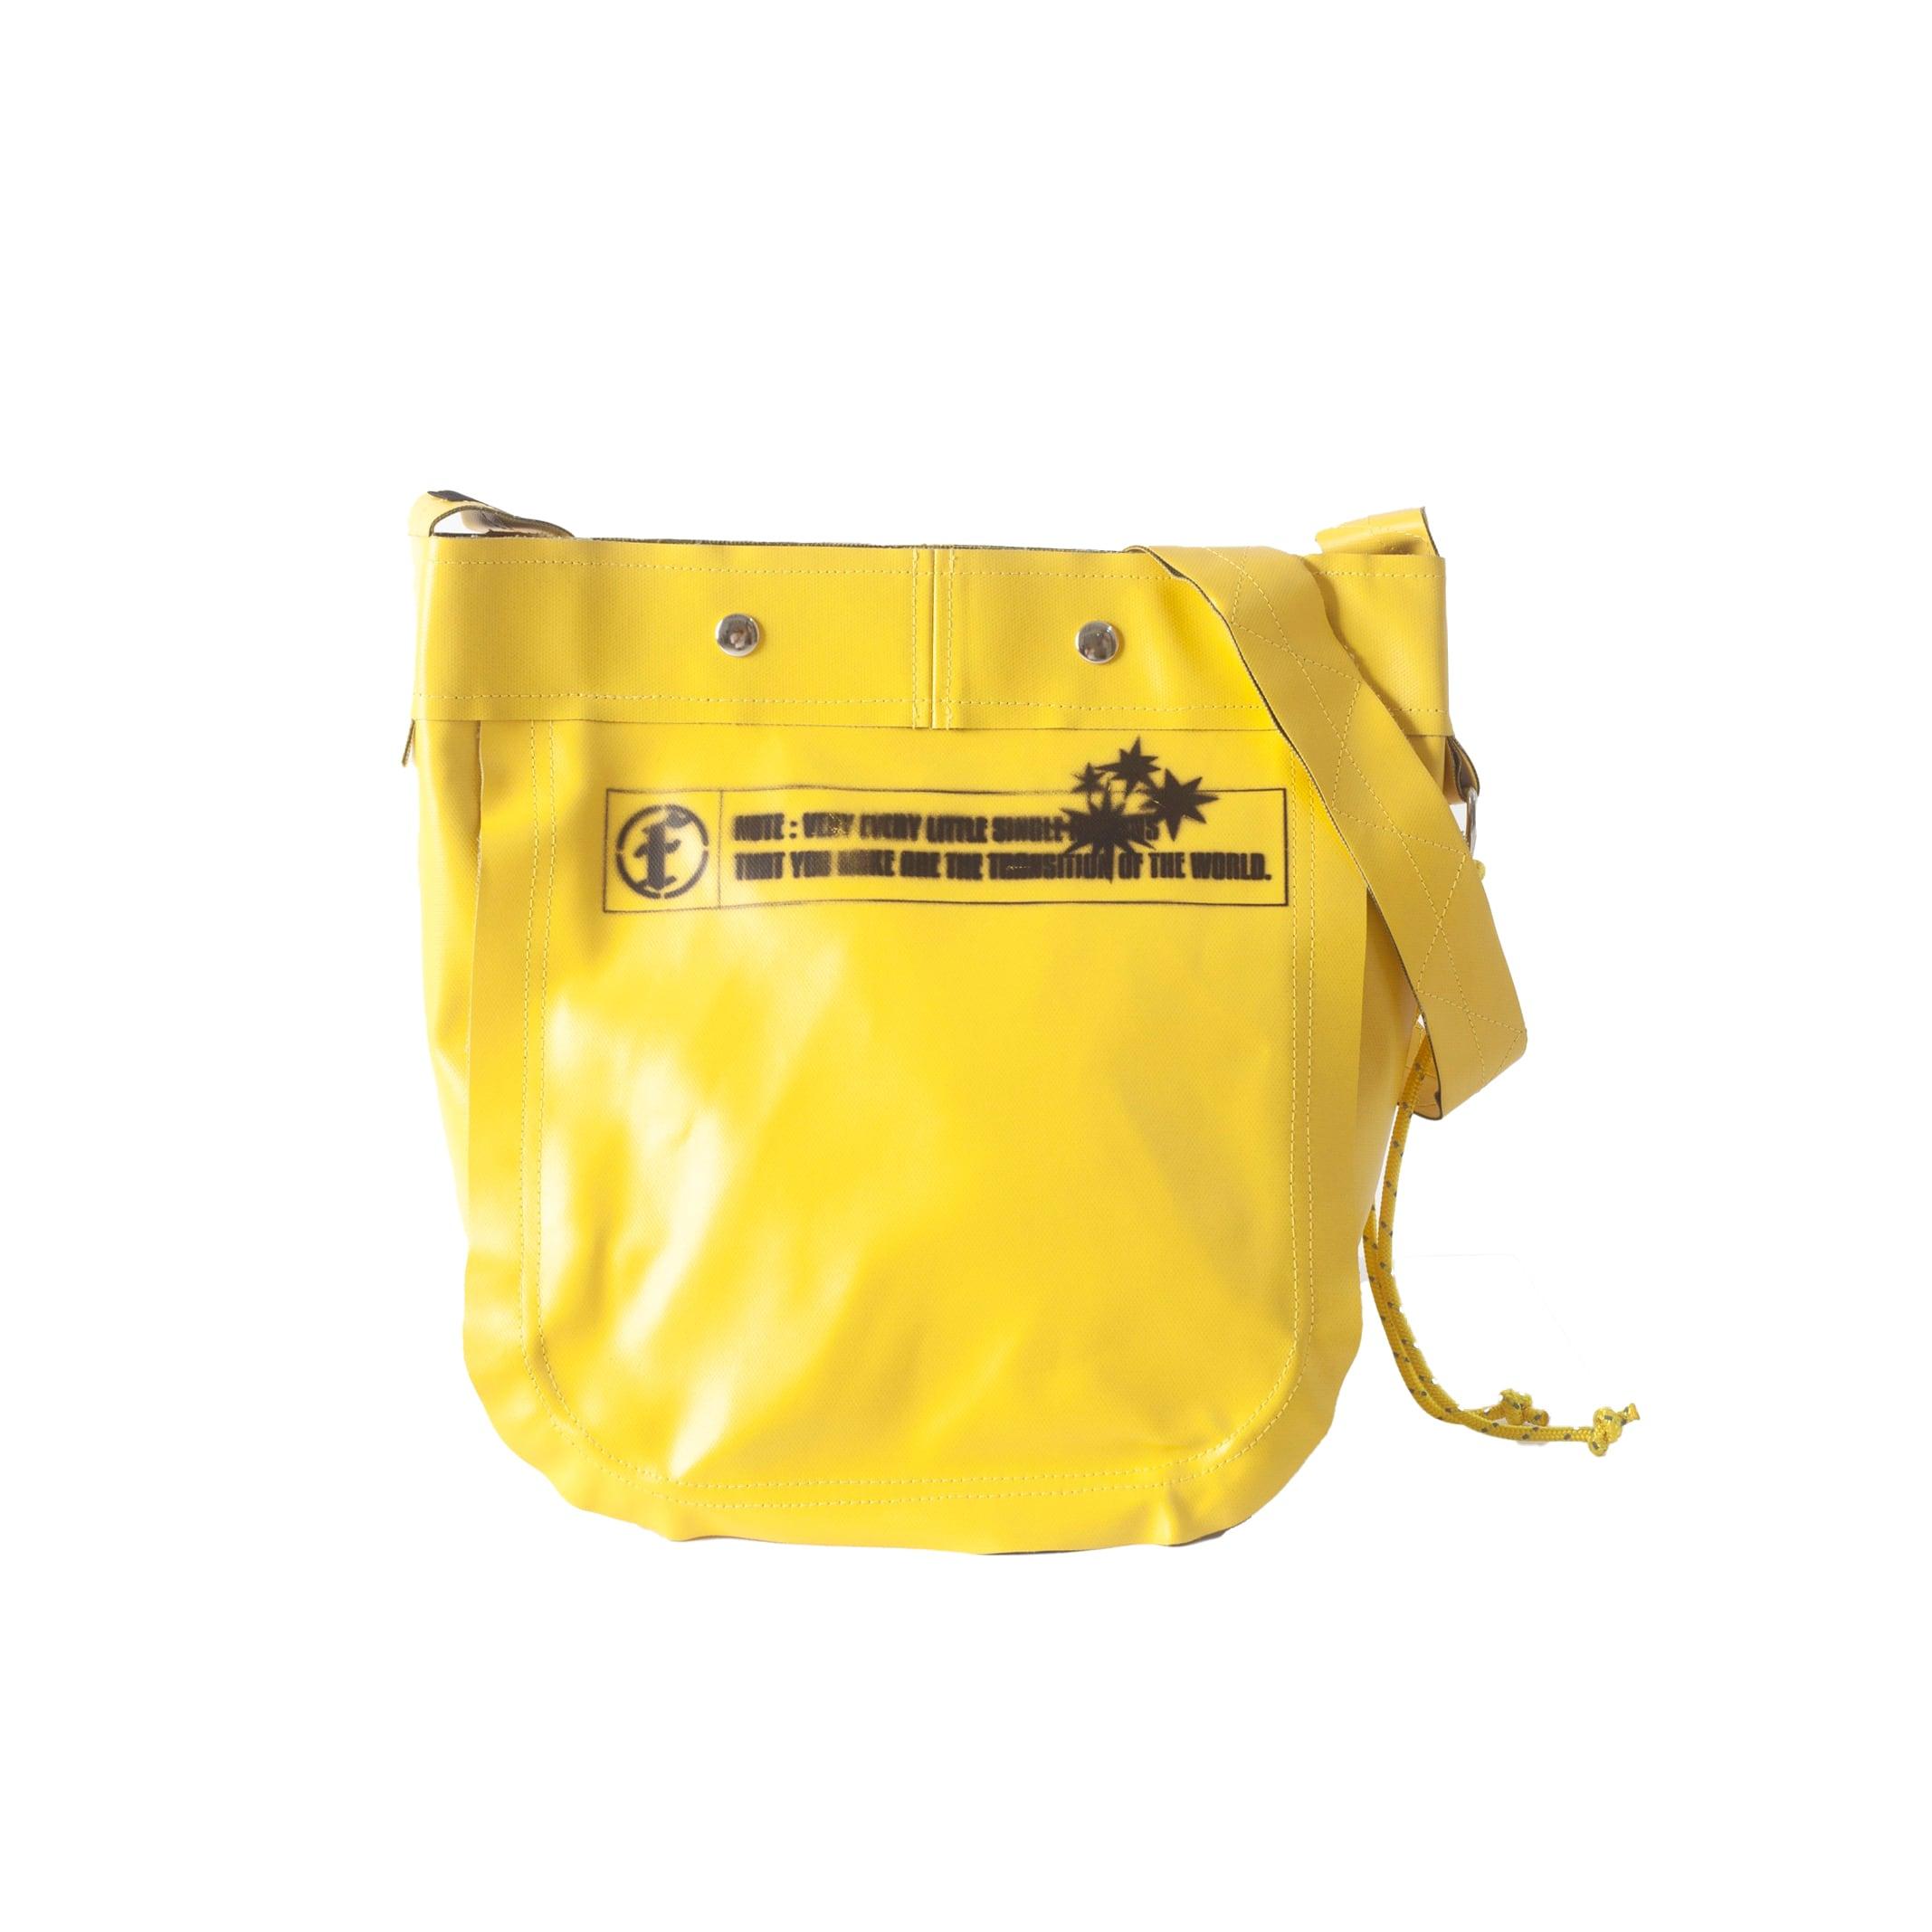 PVC CANVAS SMALL SHOULDER BAG / YELLOW GREEN - 画像1